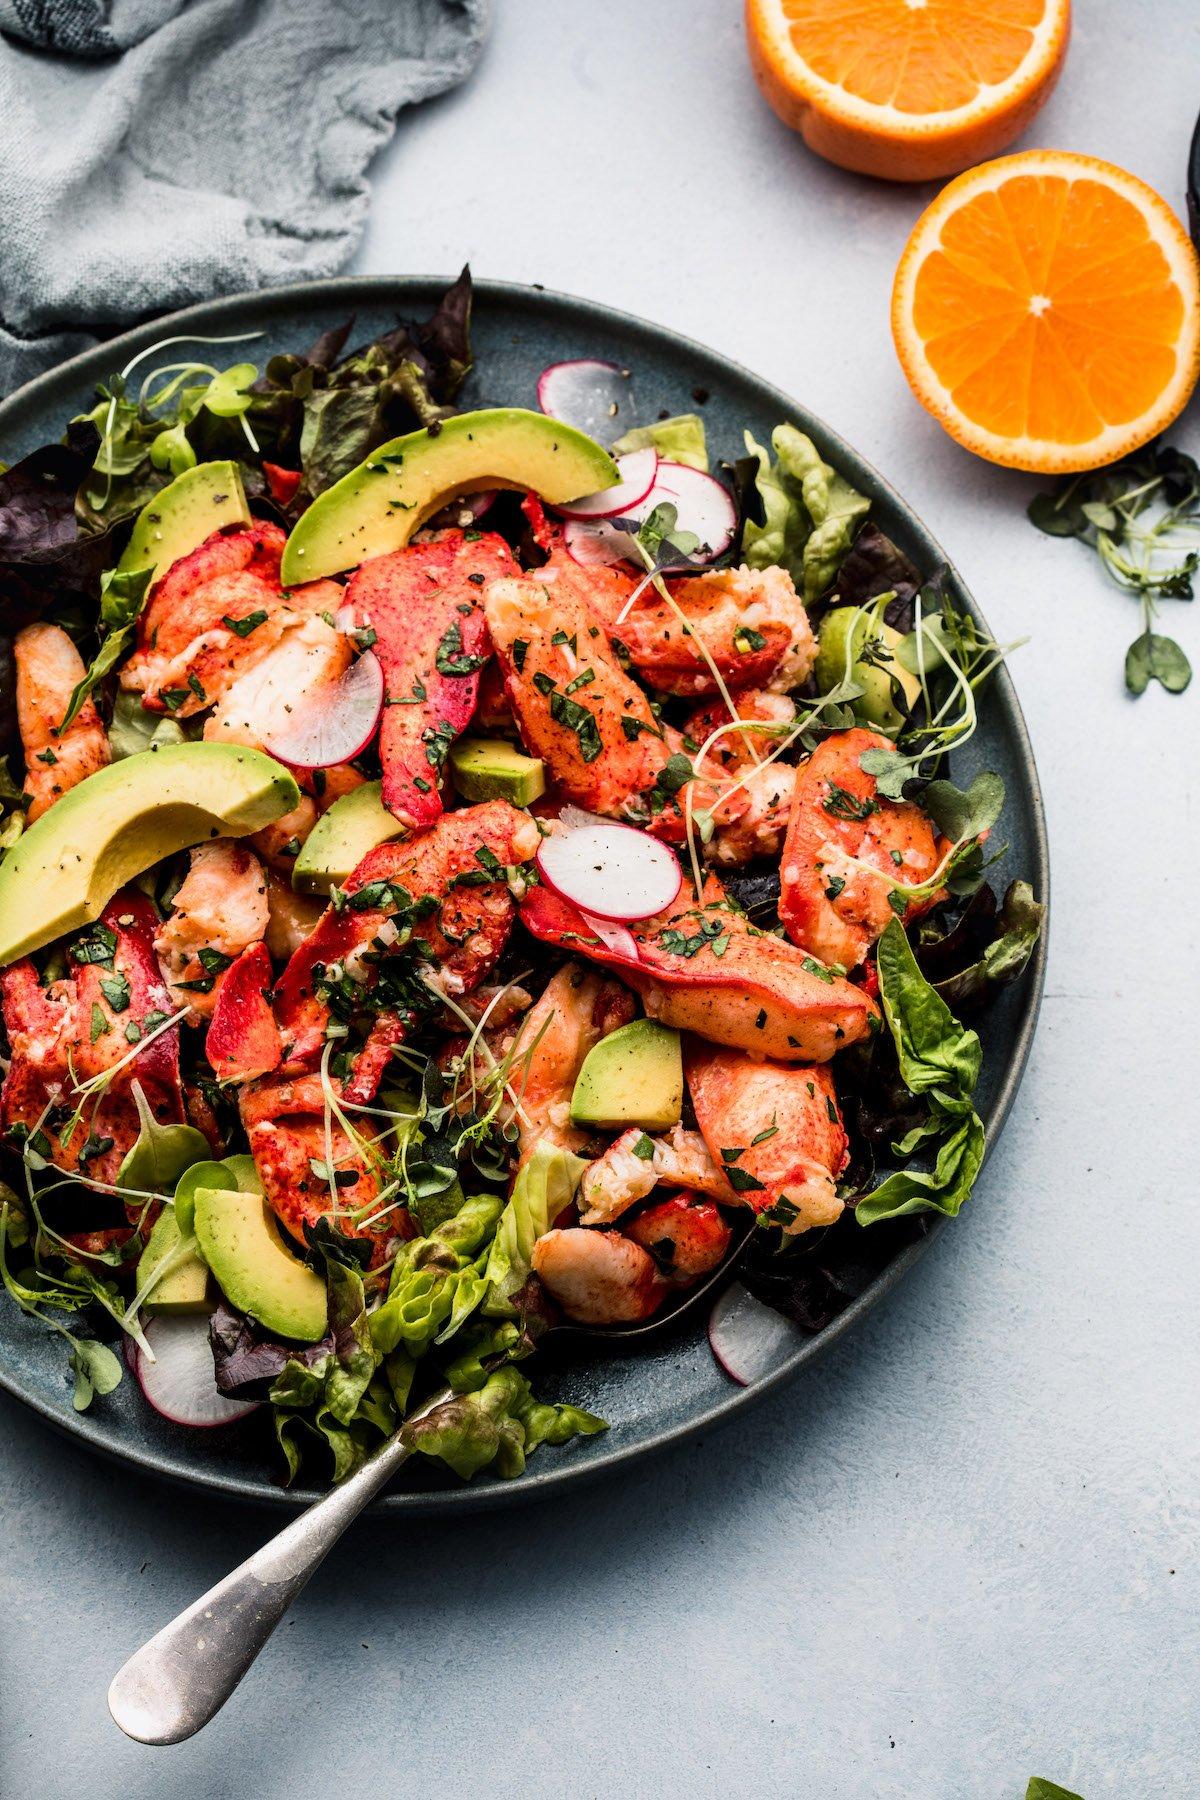 Chilled Maine Lobster with Orange & Basil Vinaigrette